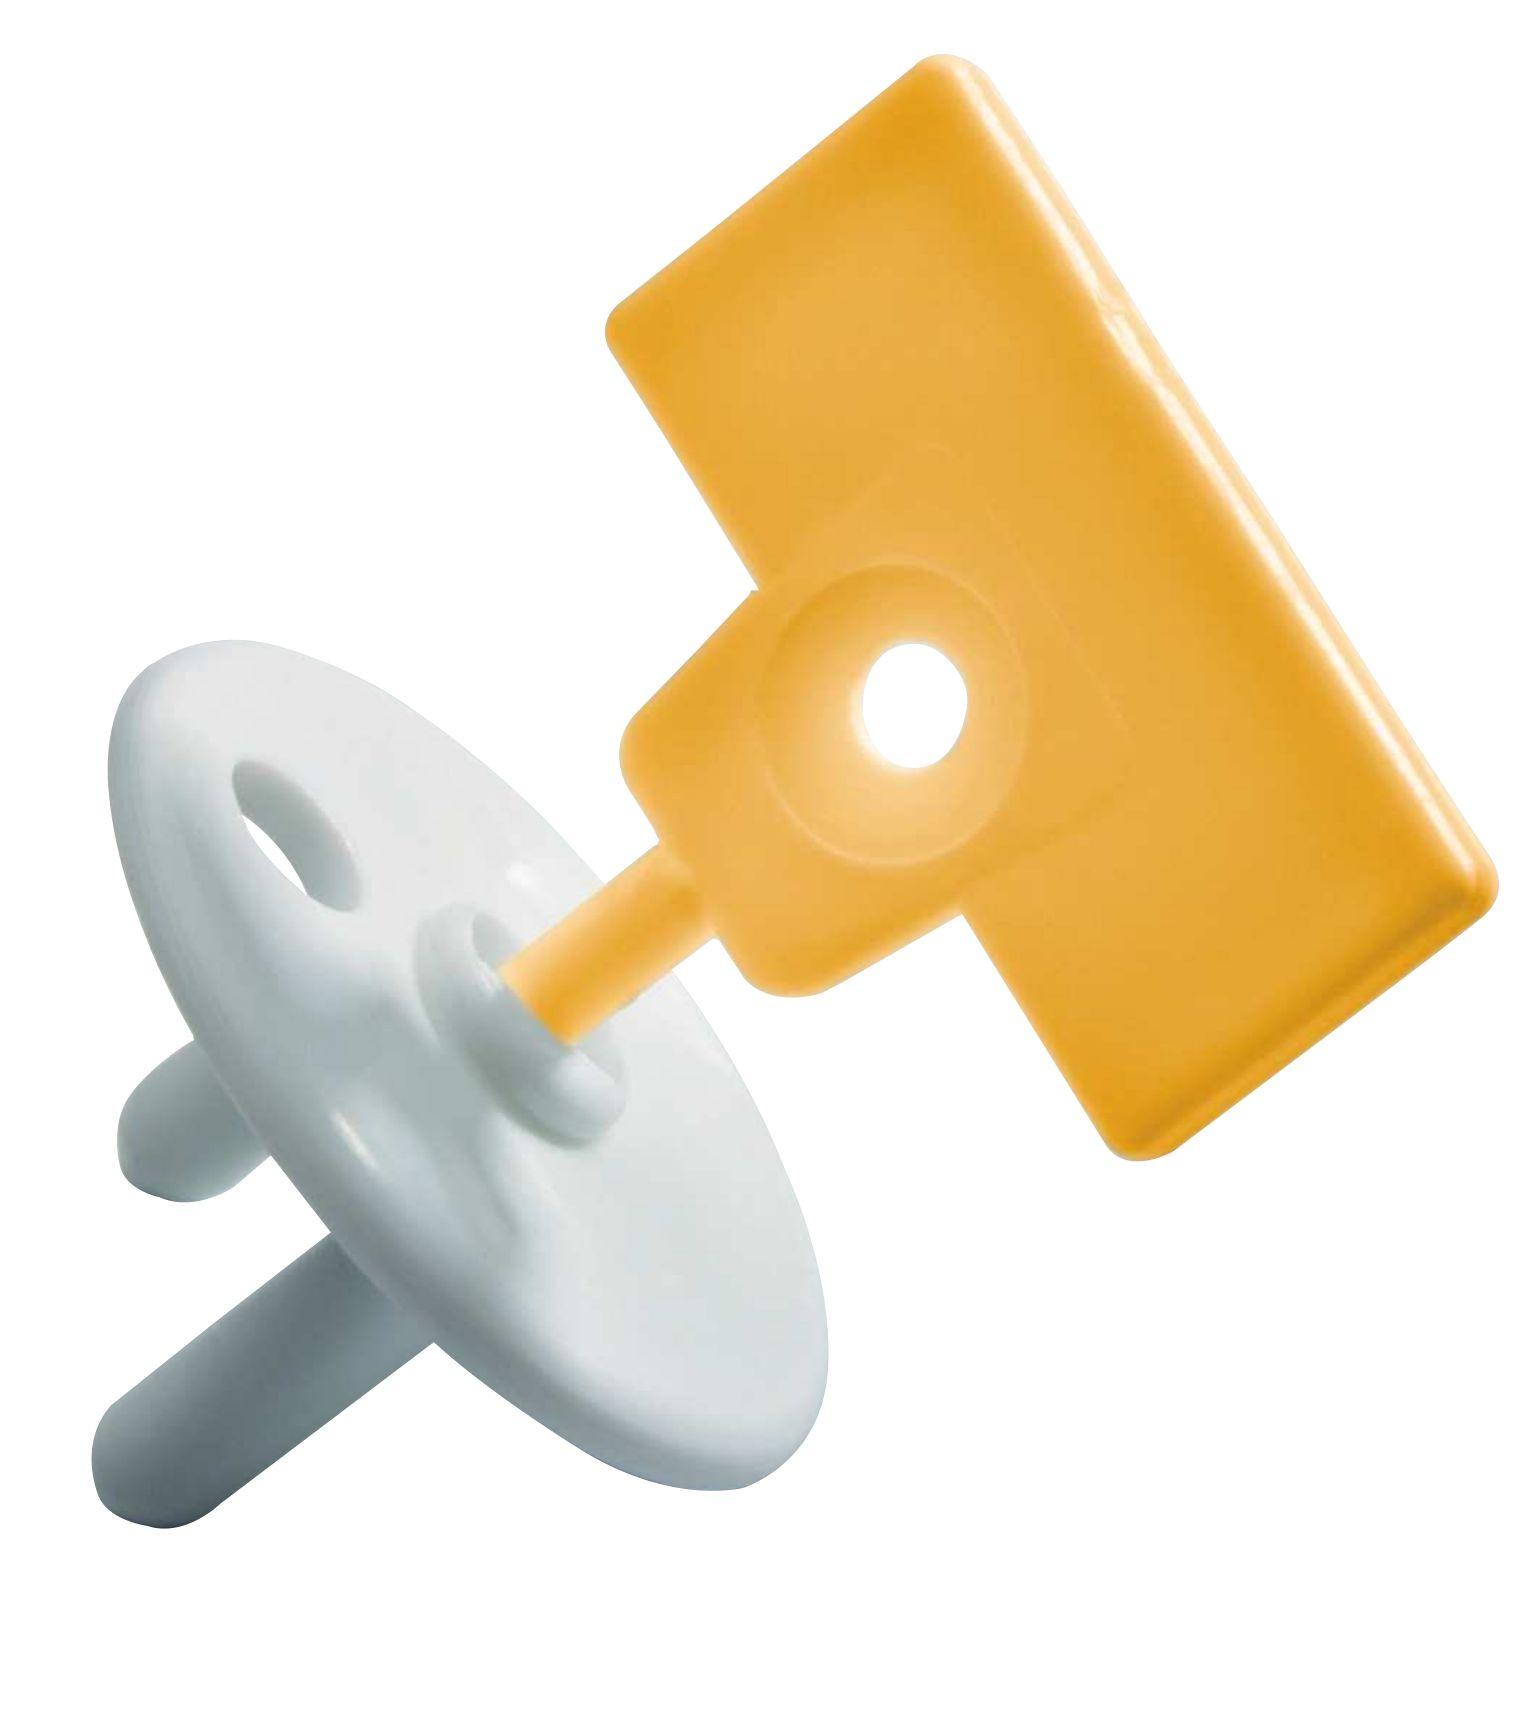 Заглушка для розеток Safety 1st Заглушка для розетки с ключом (12 шт.) 3202002000, Полипропилен